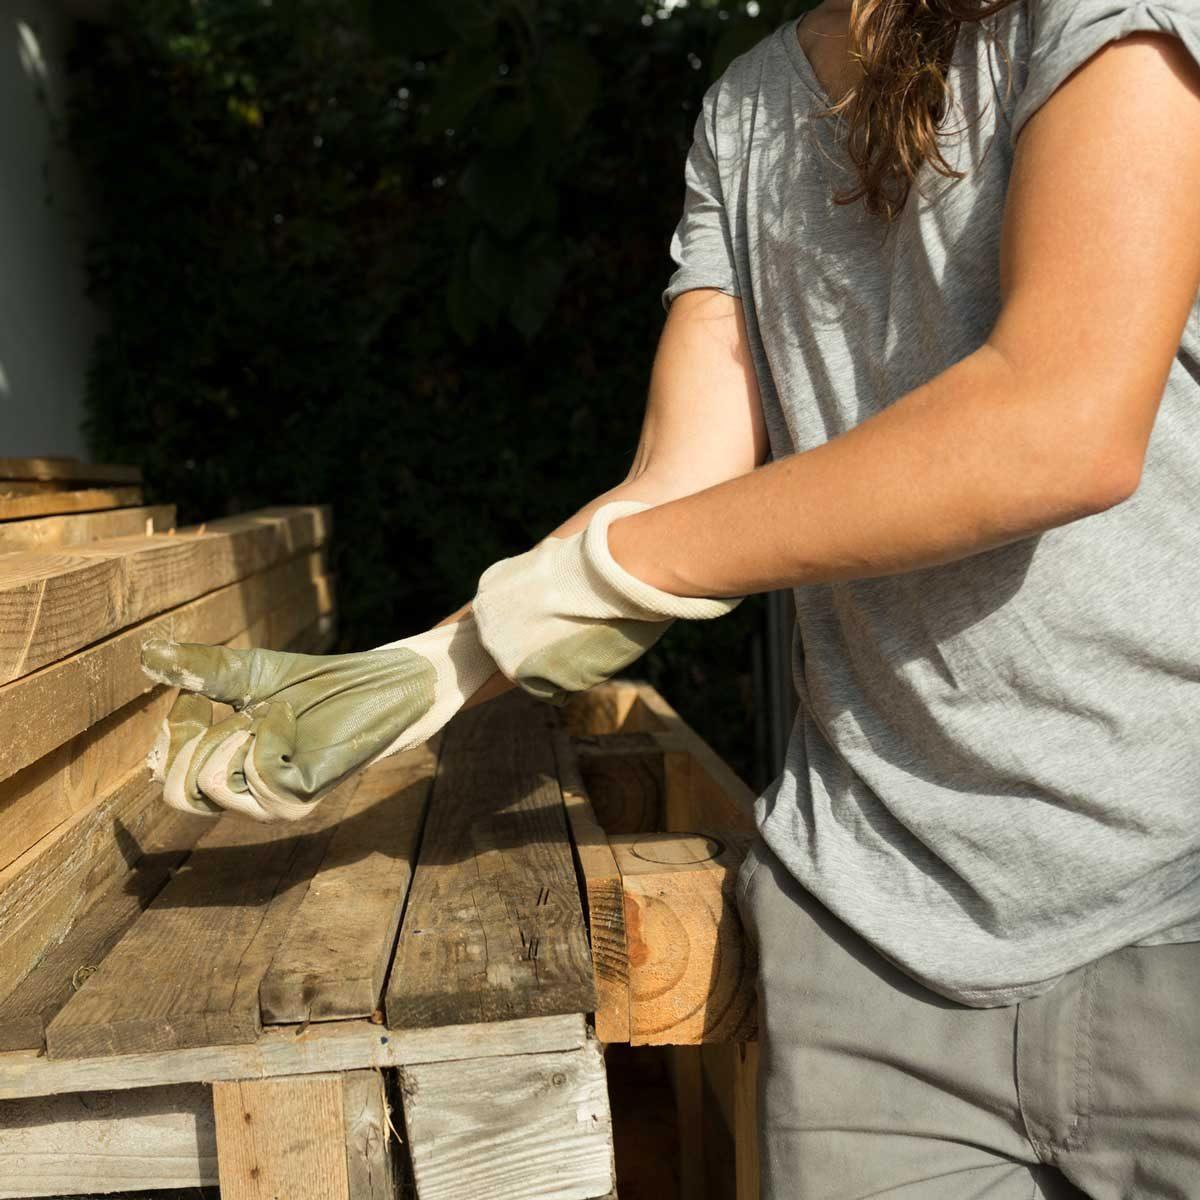 7 Best Work Gloves for Women